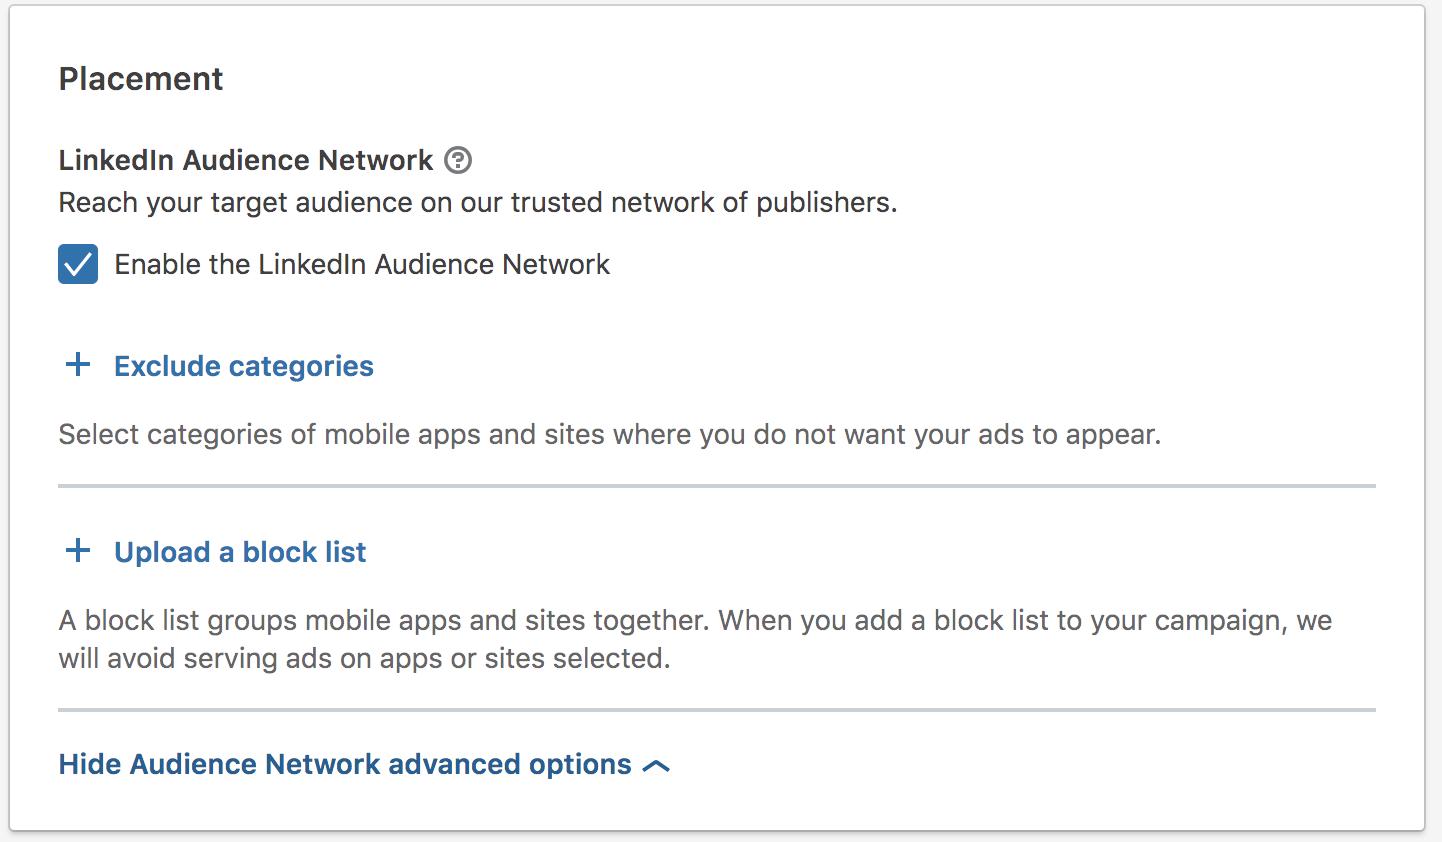 linkedin advertising linkedin audience network